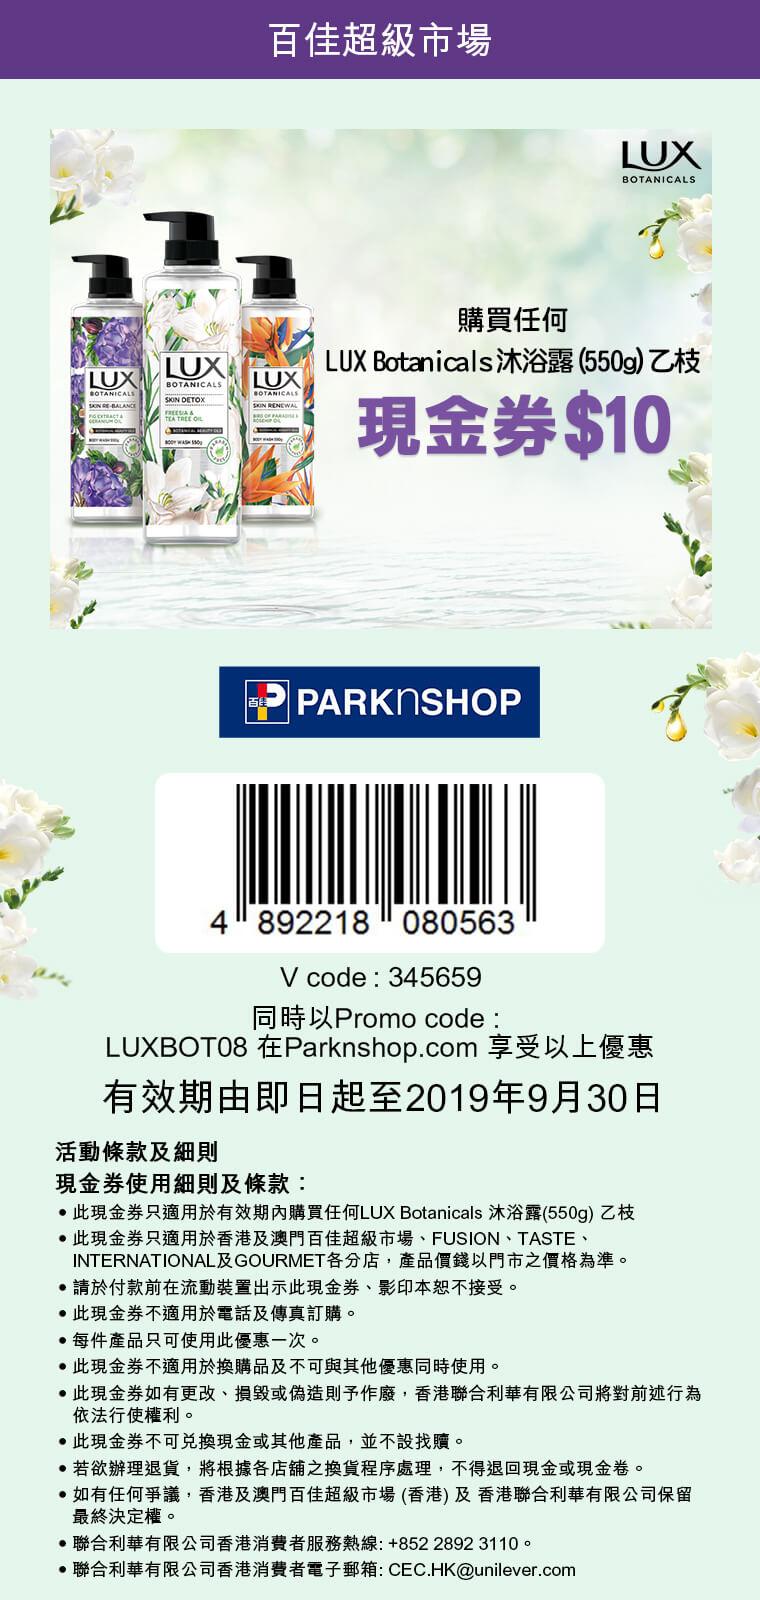 Lux Botanicals - ParkNShop